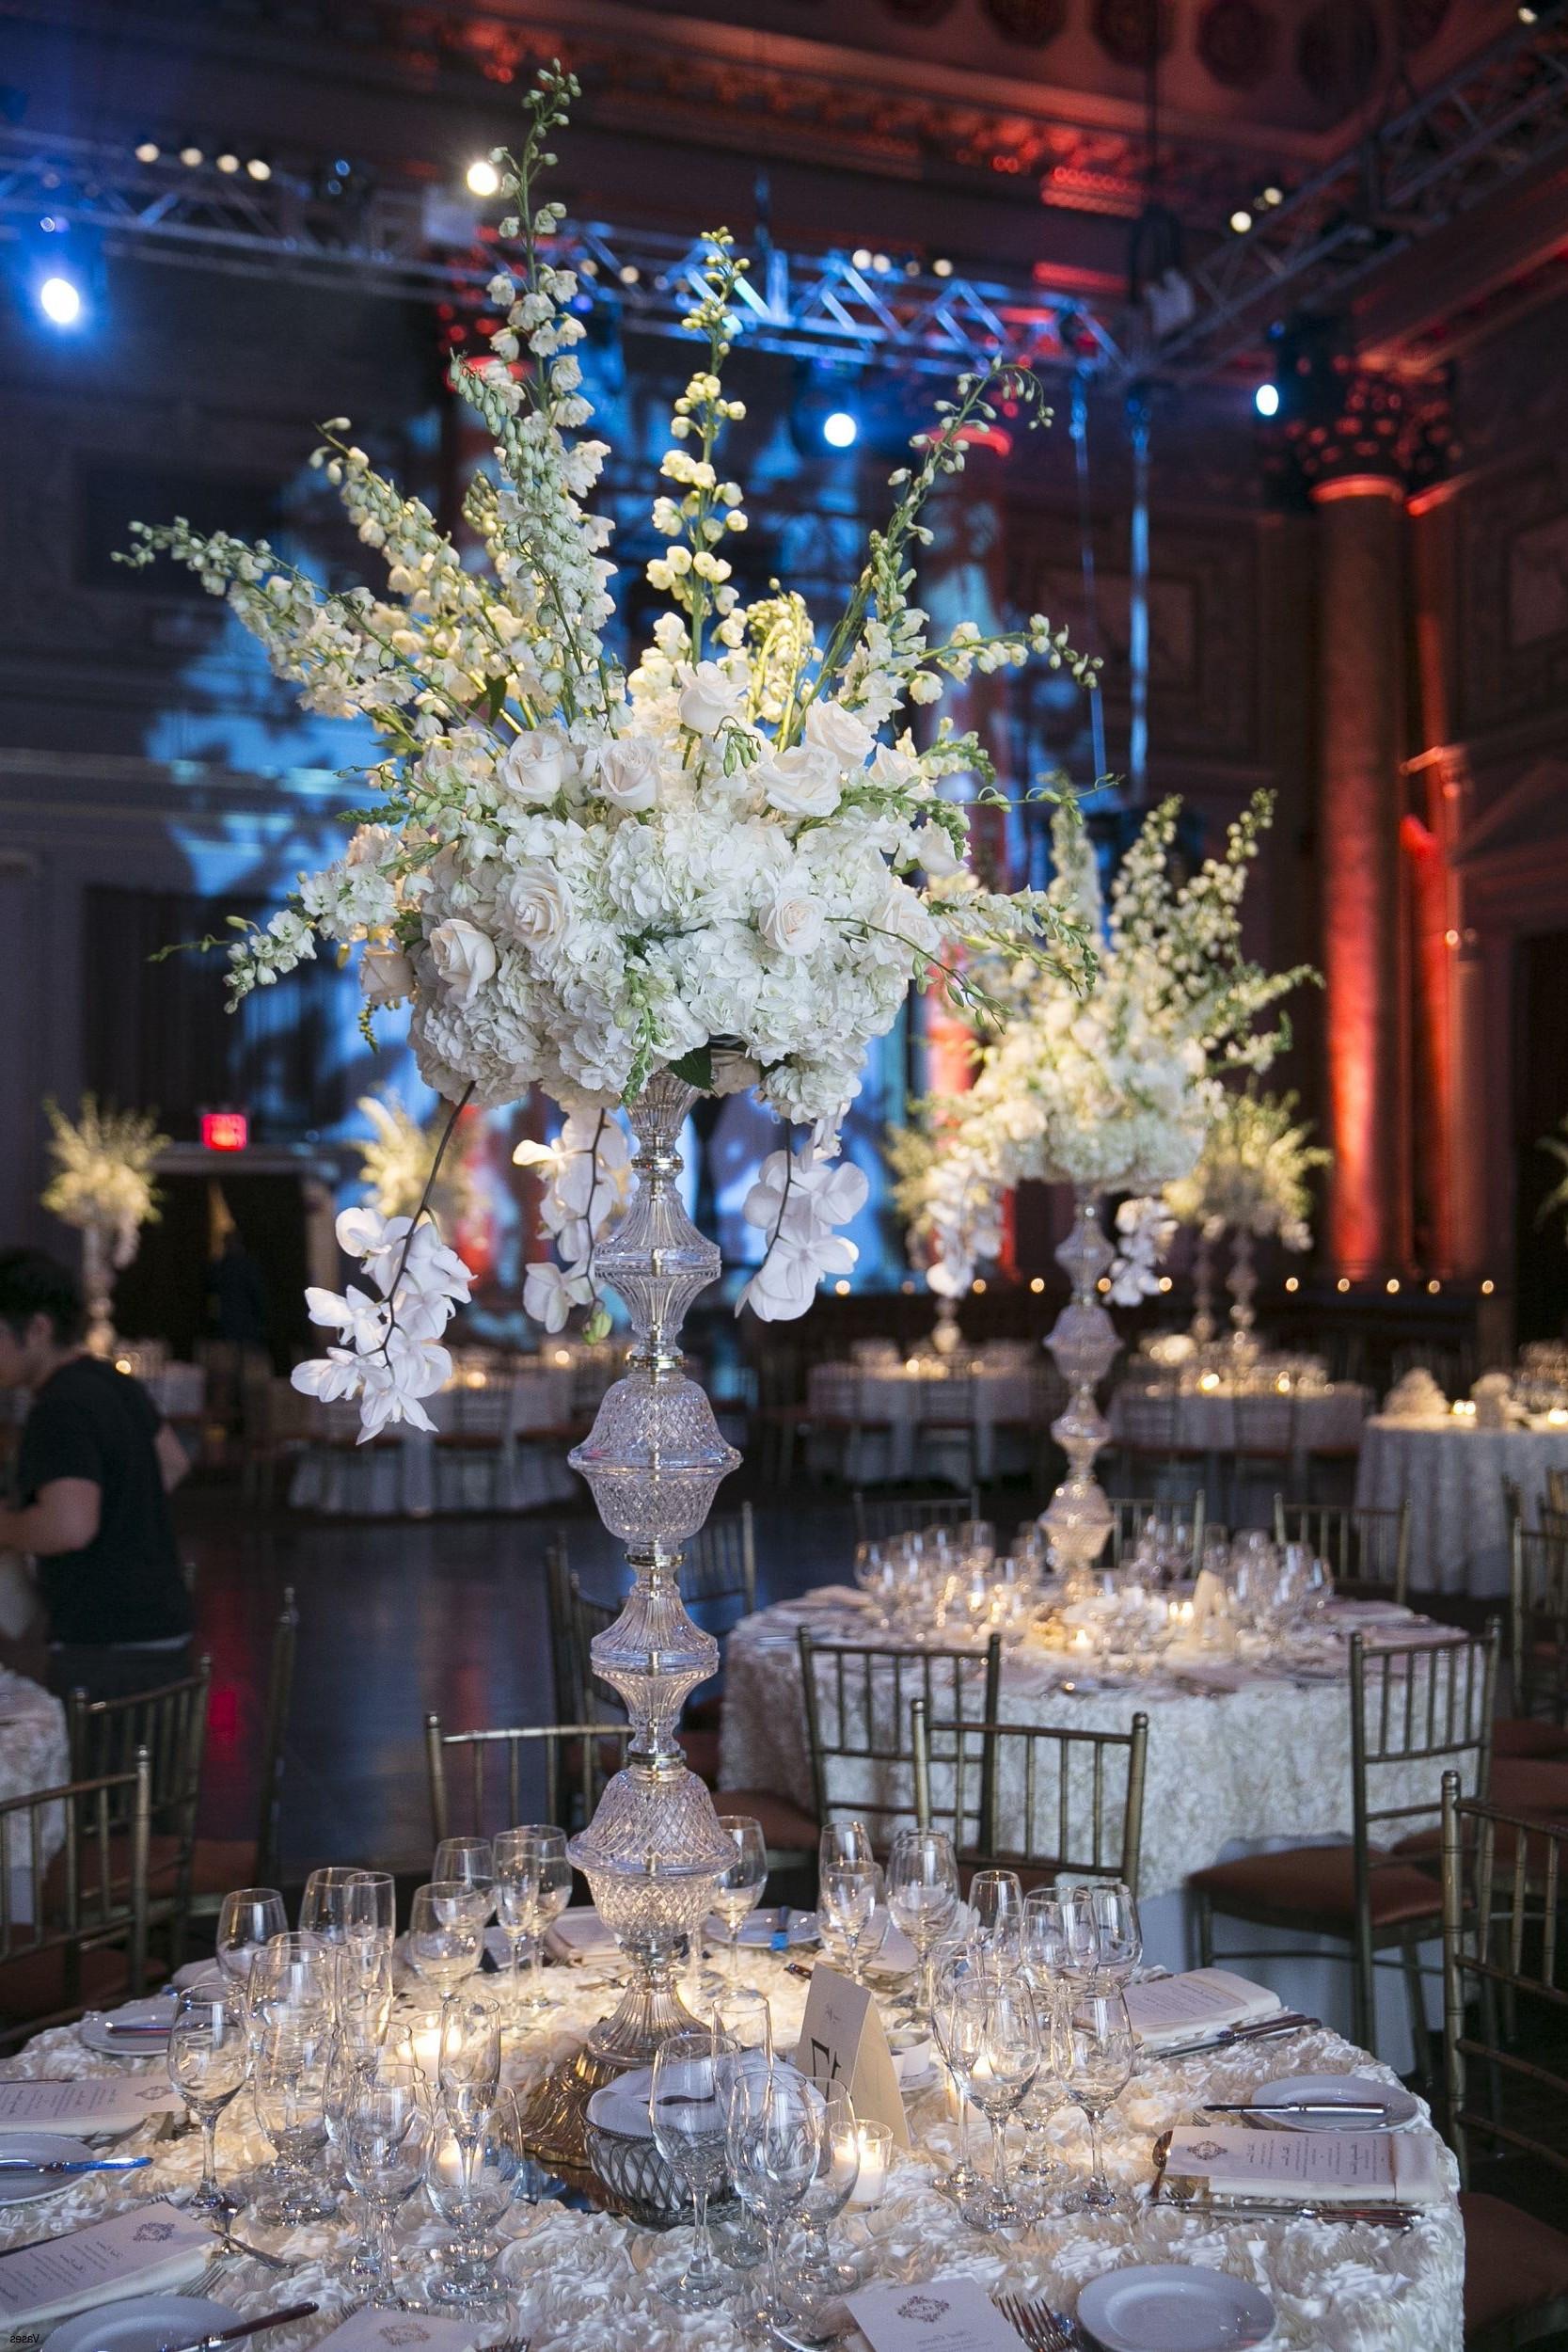 cheap tall plastic vases for centerpieces of 10 fresh crystal vase bogekompresorturkiye com inside crystal beads for wedding decoration elegant vases tall crystal wedding winter centerpiecesi 0d beaded for